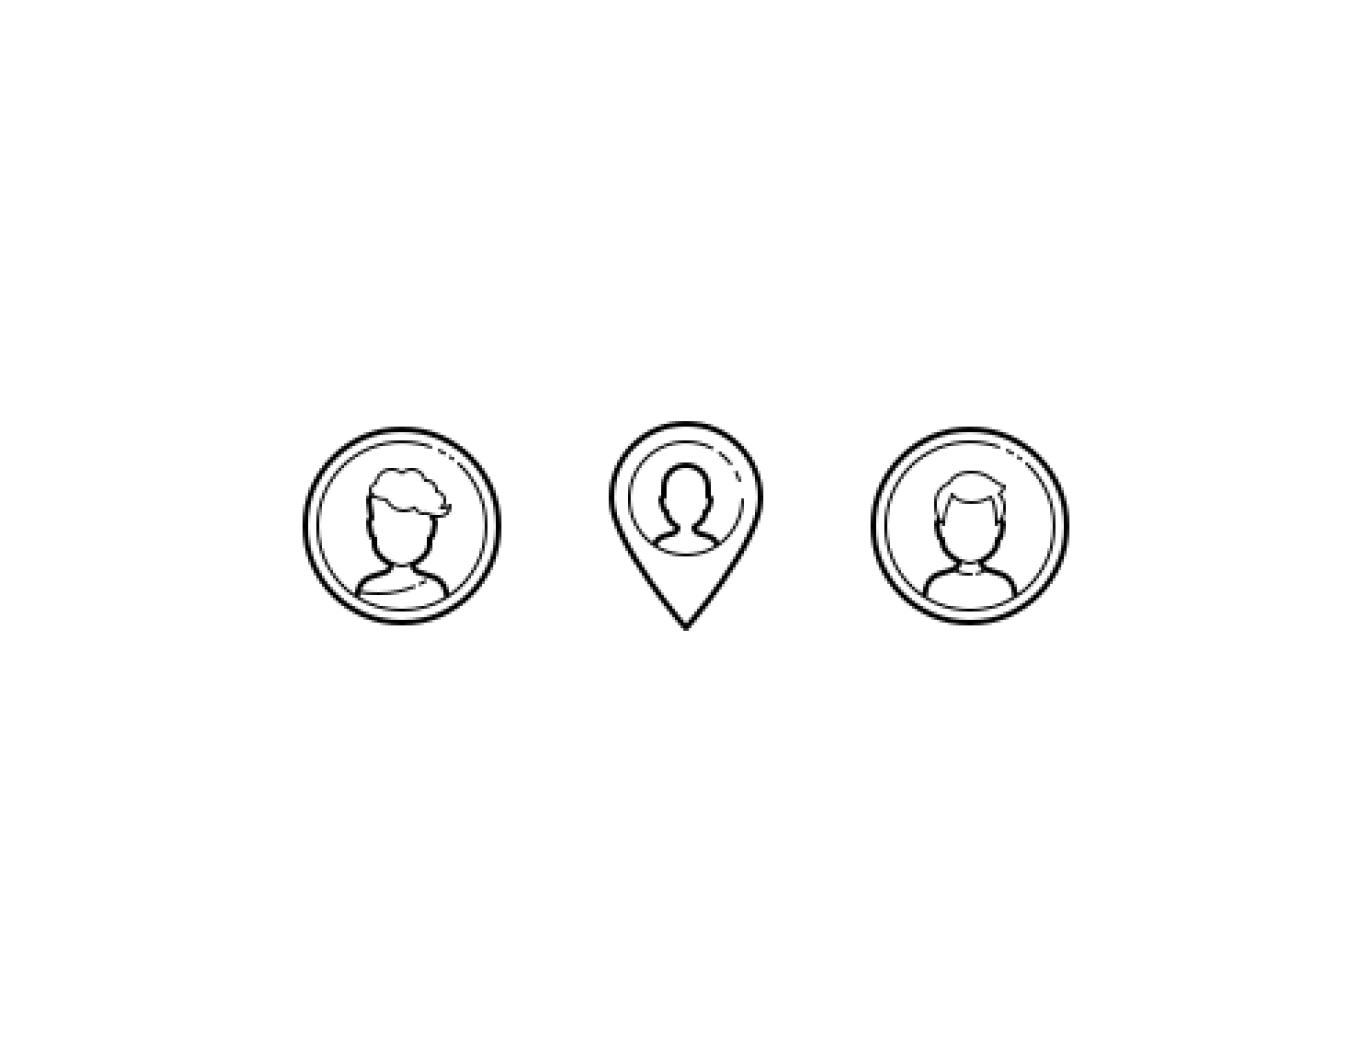 Symbols for Trade Area Analysis